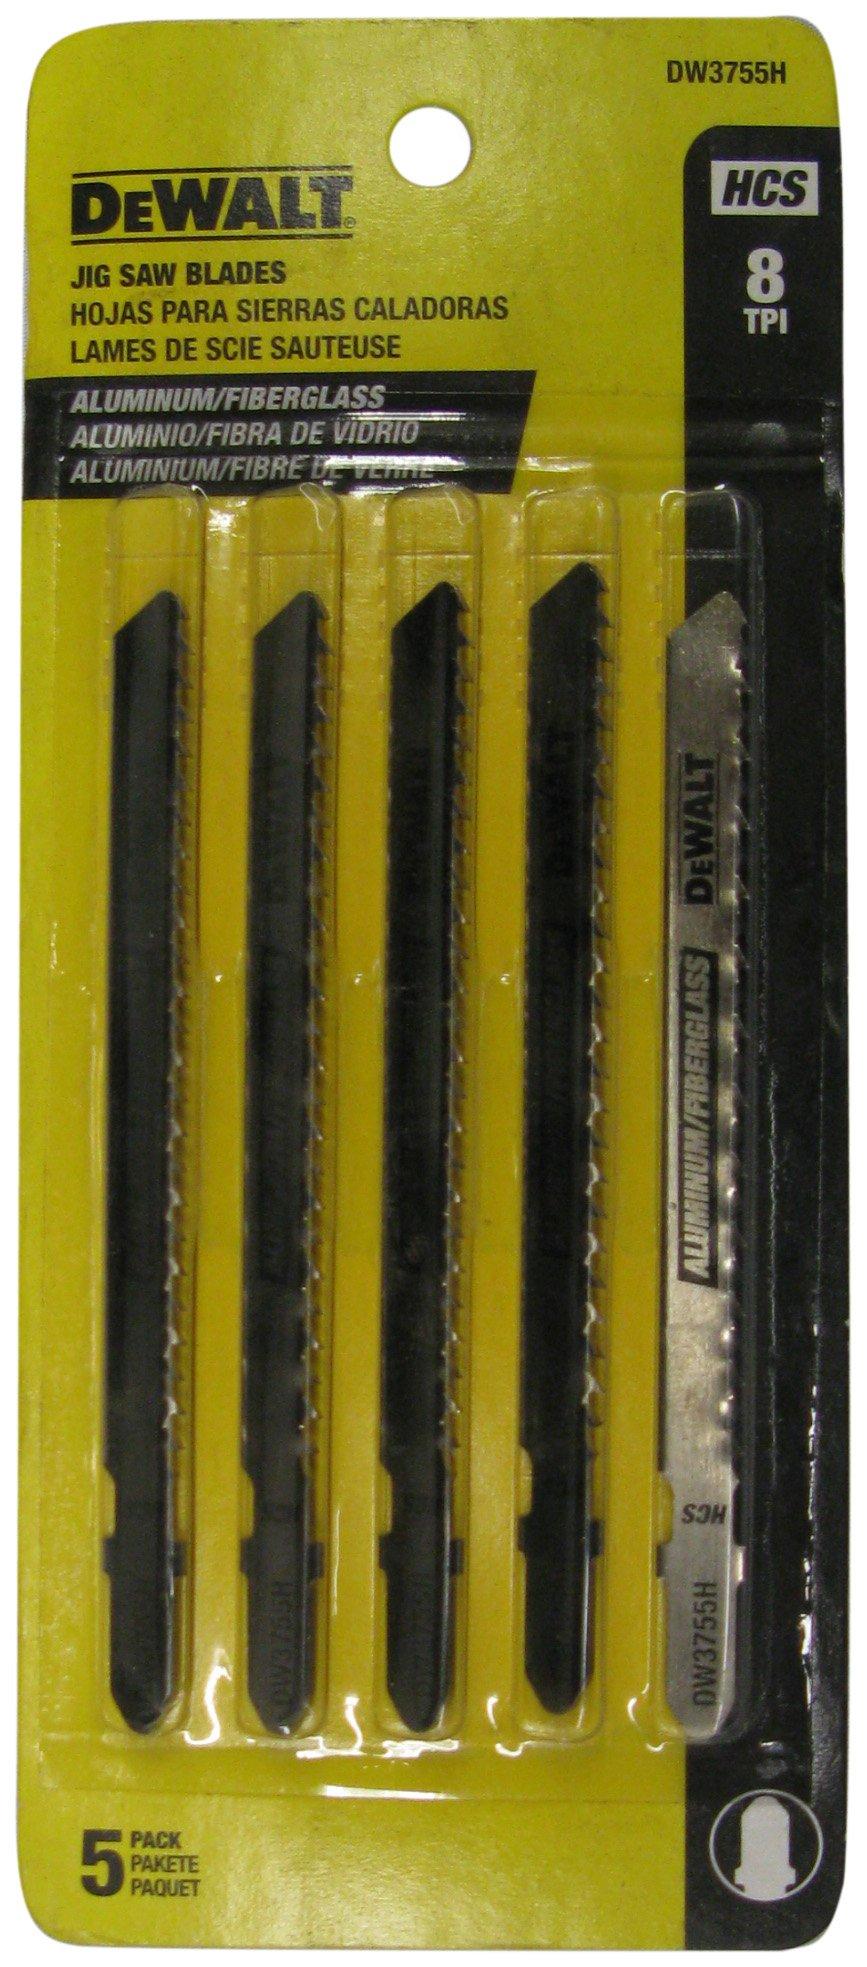 DEWALT DW3755H 4-Inch 8 TPI Aluminum/Fiberglass Cut HCS T-Shank Jig Saw Blade (5-Pack)